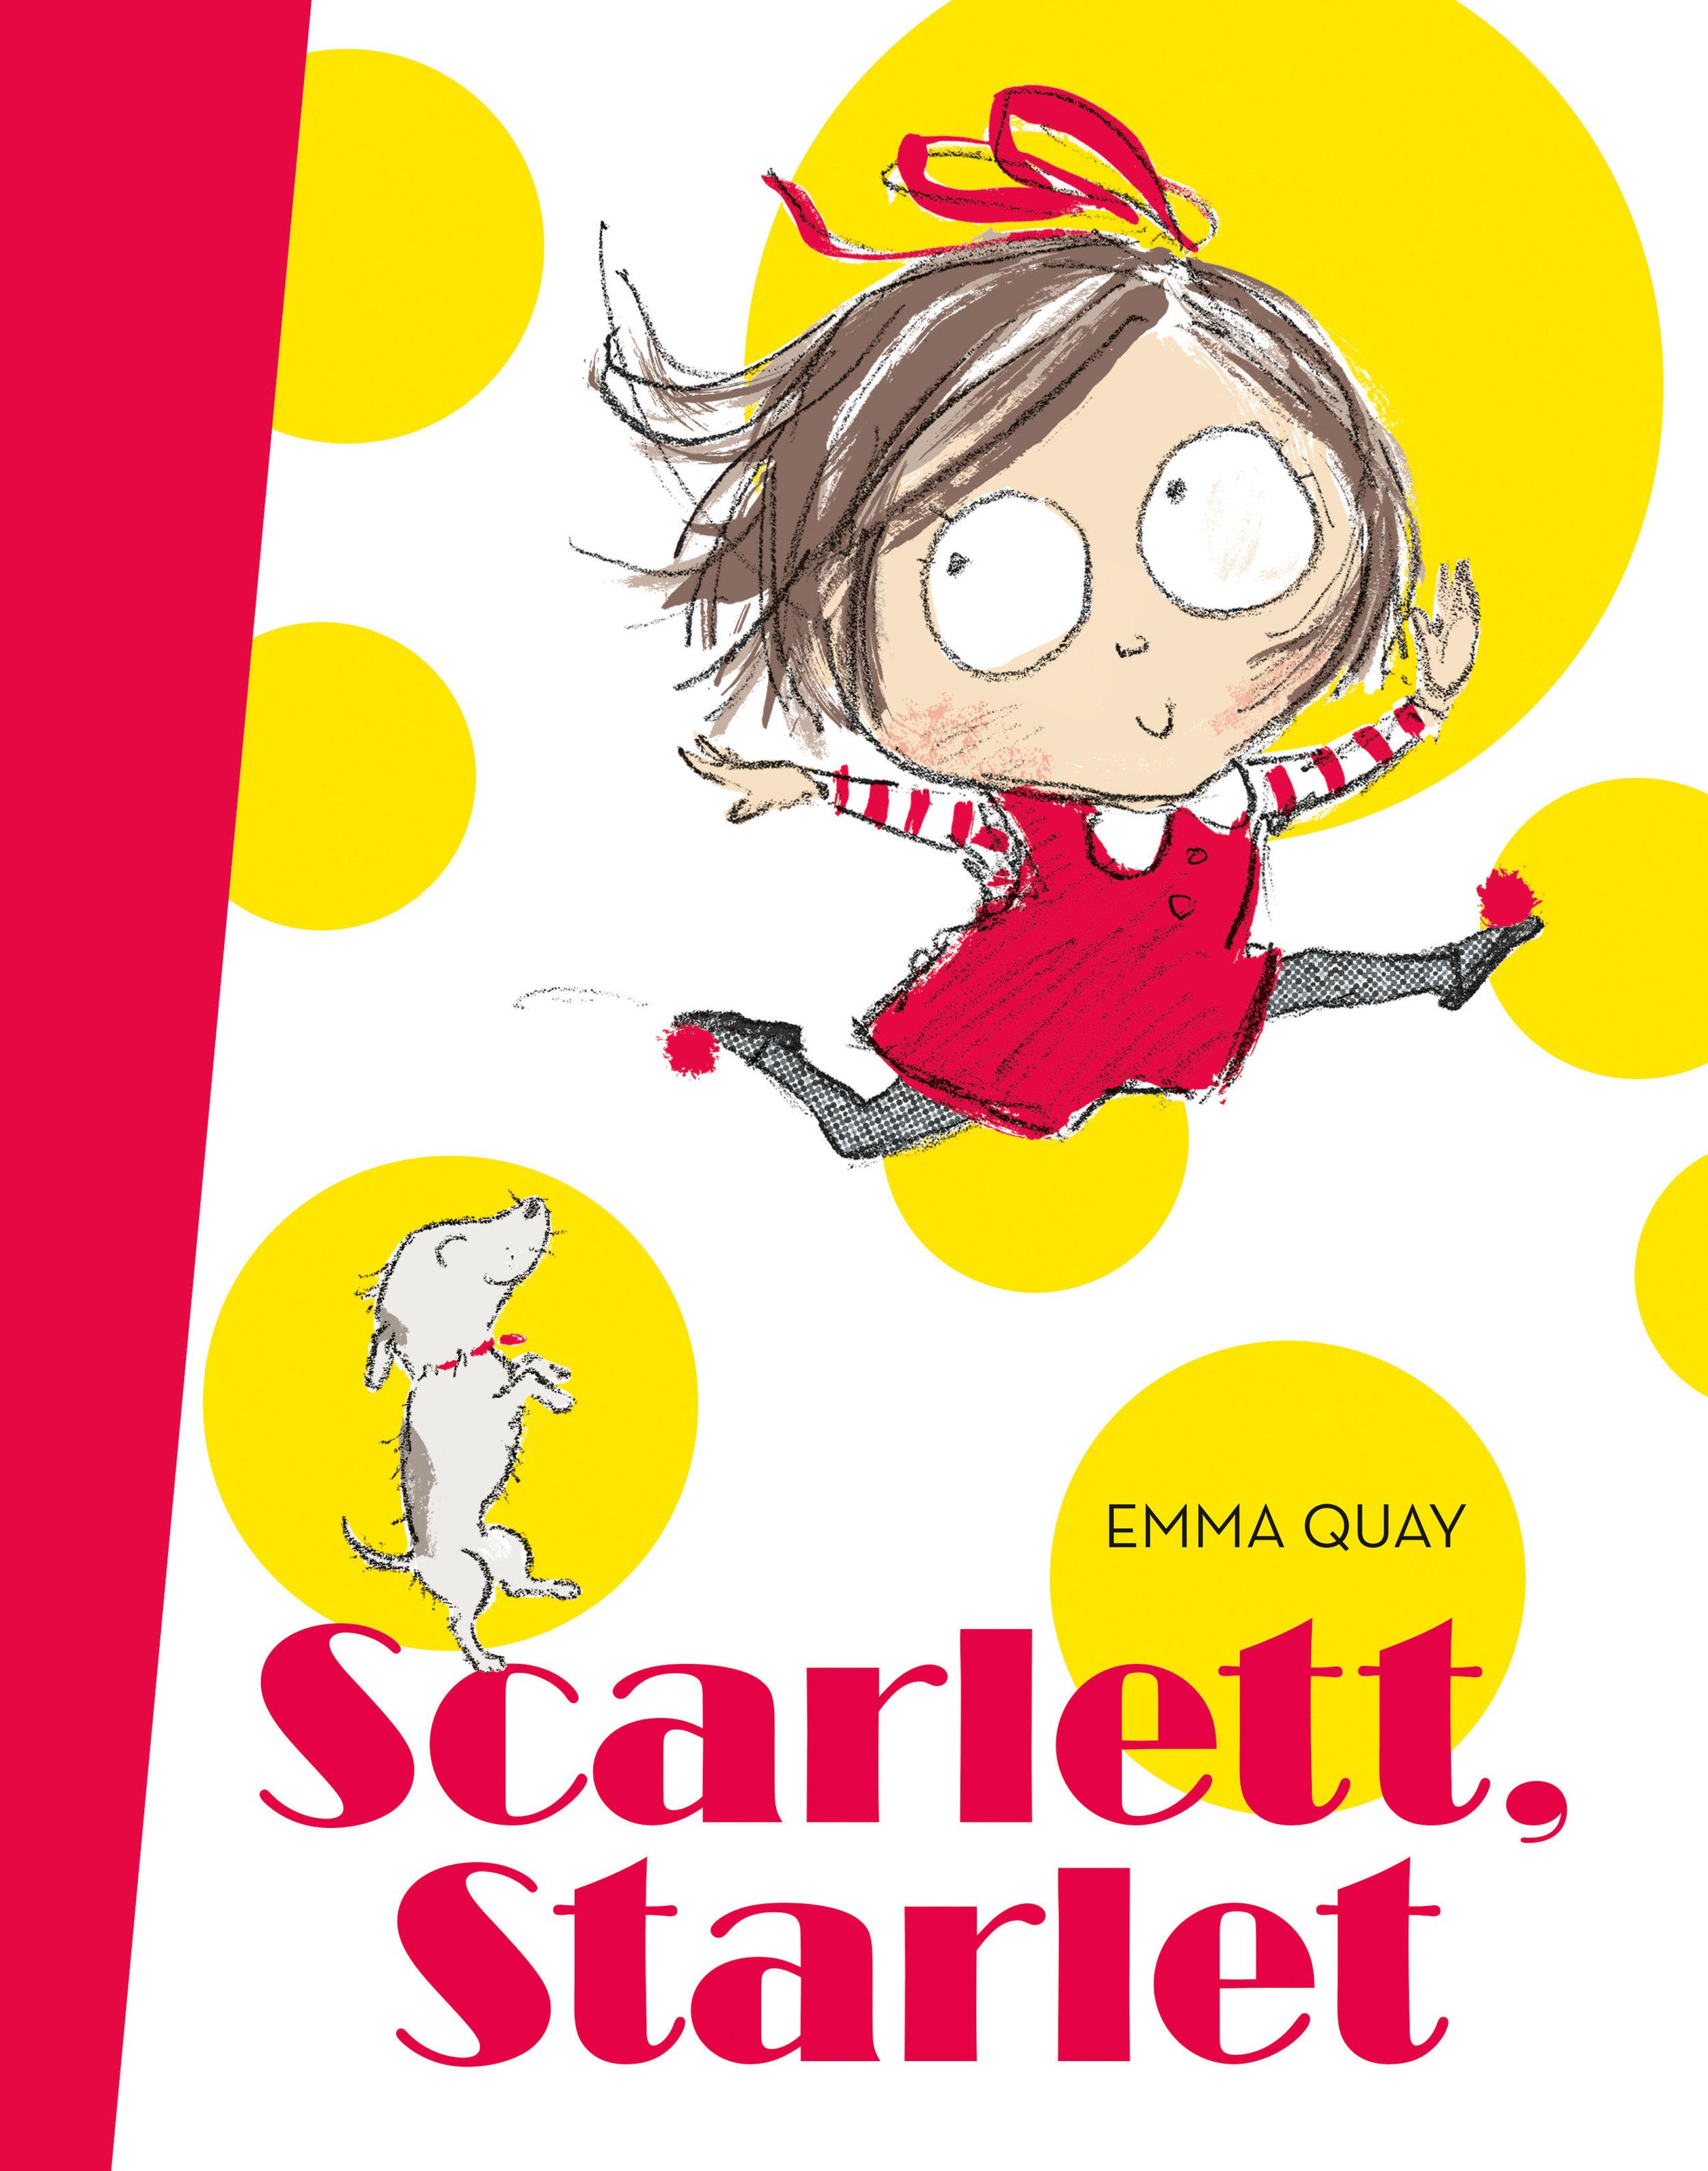 SCARLETT, STARLET by Emma Quay (ABC Books) http://www.emmaquay.com